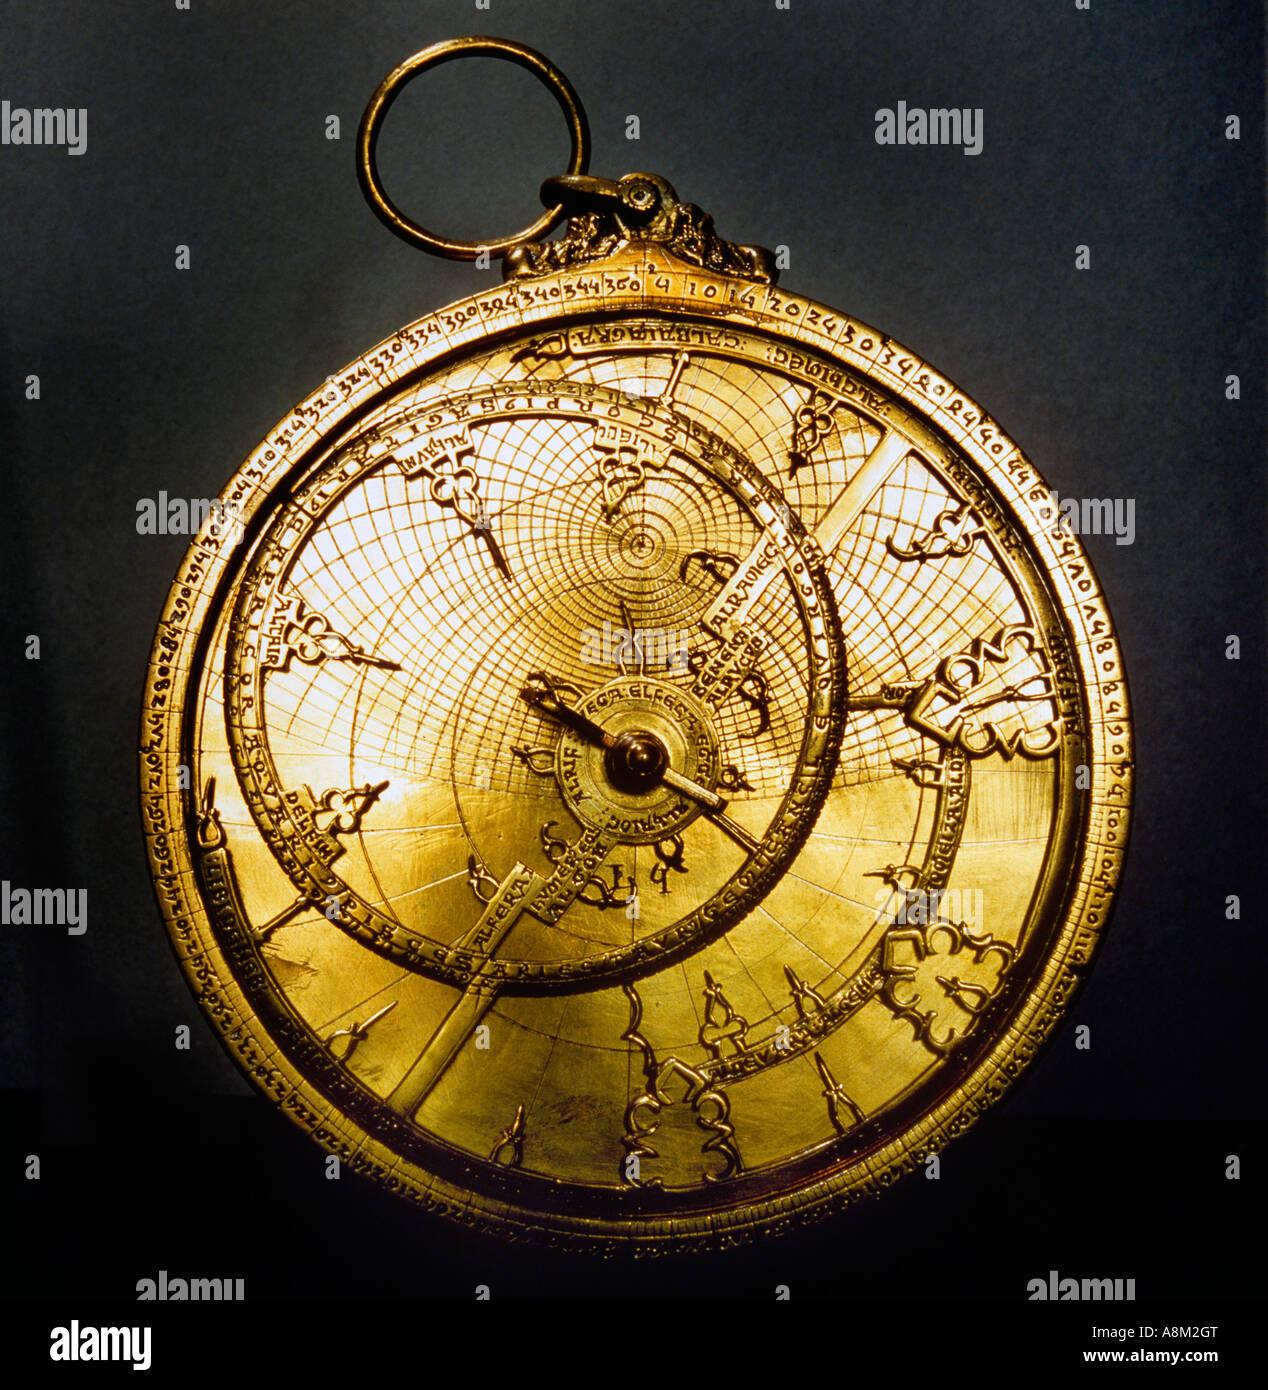 Astrolabio Imagen De Stock